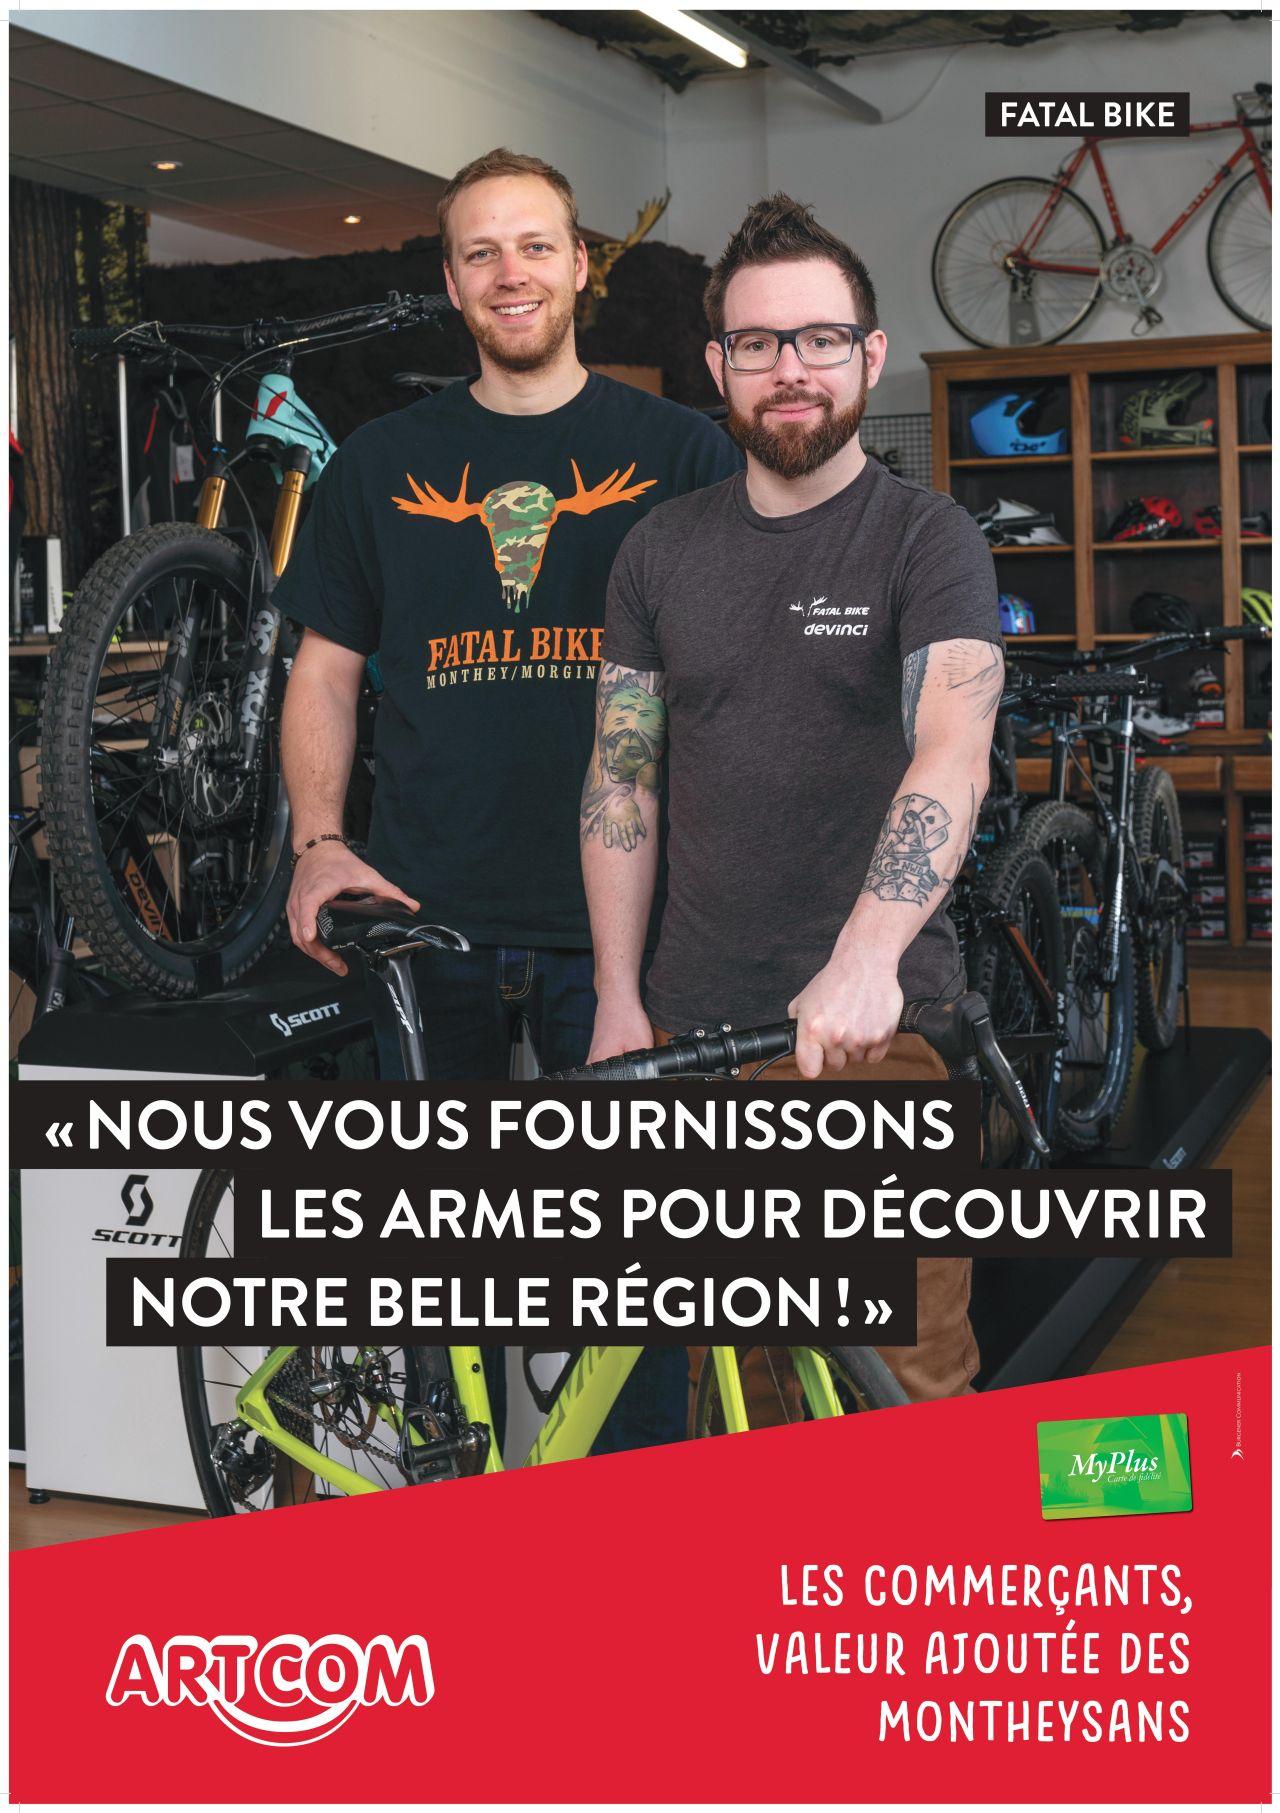 Affiche Fatal bike